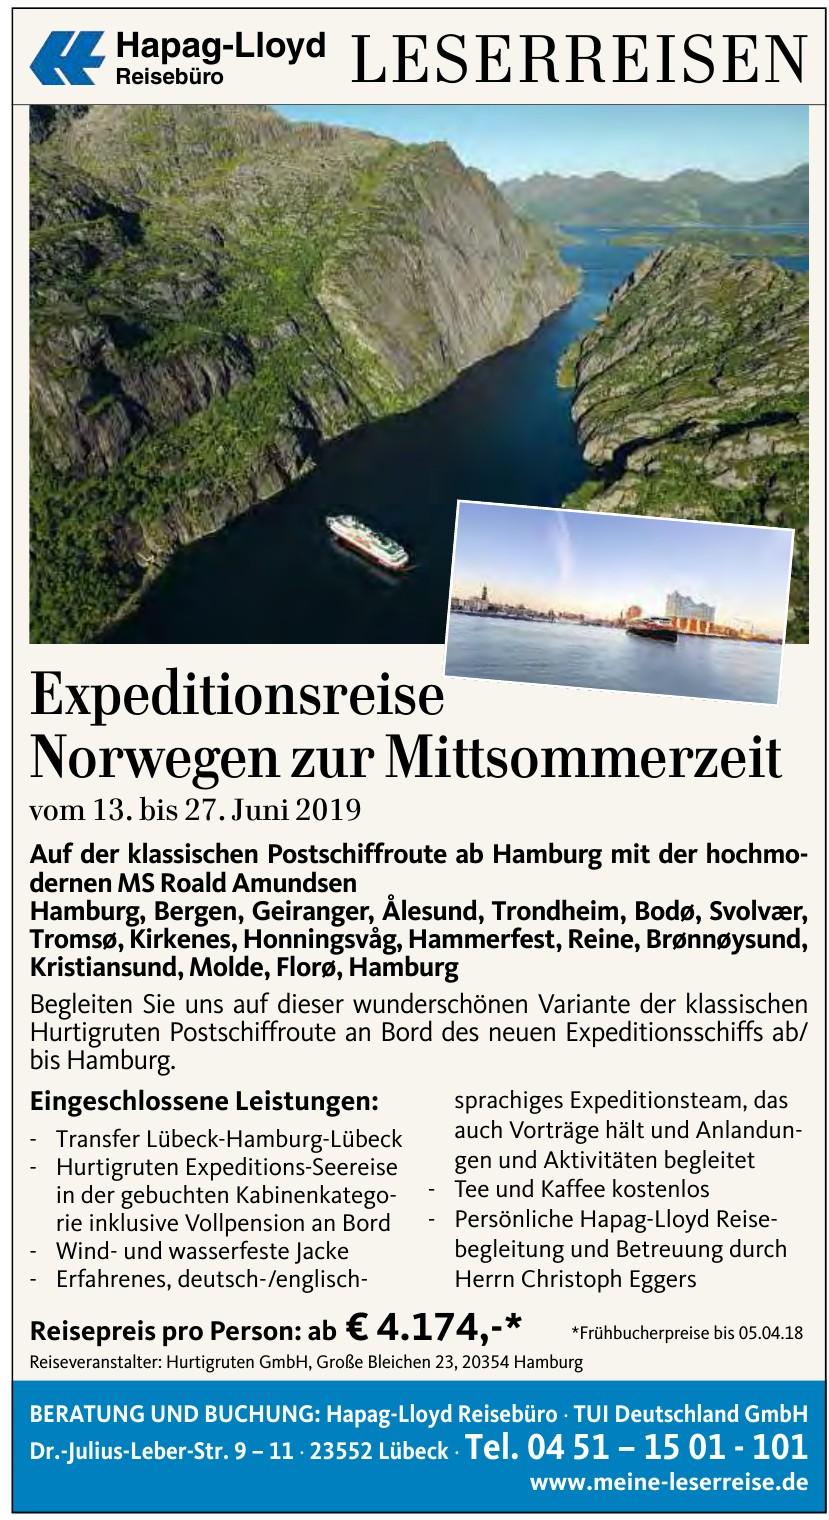 Hapag-Lloyd Reisebüro TUI Deutschland GmbH